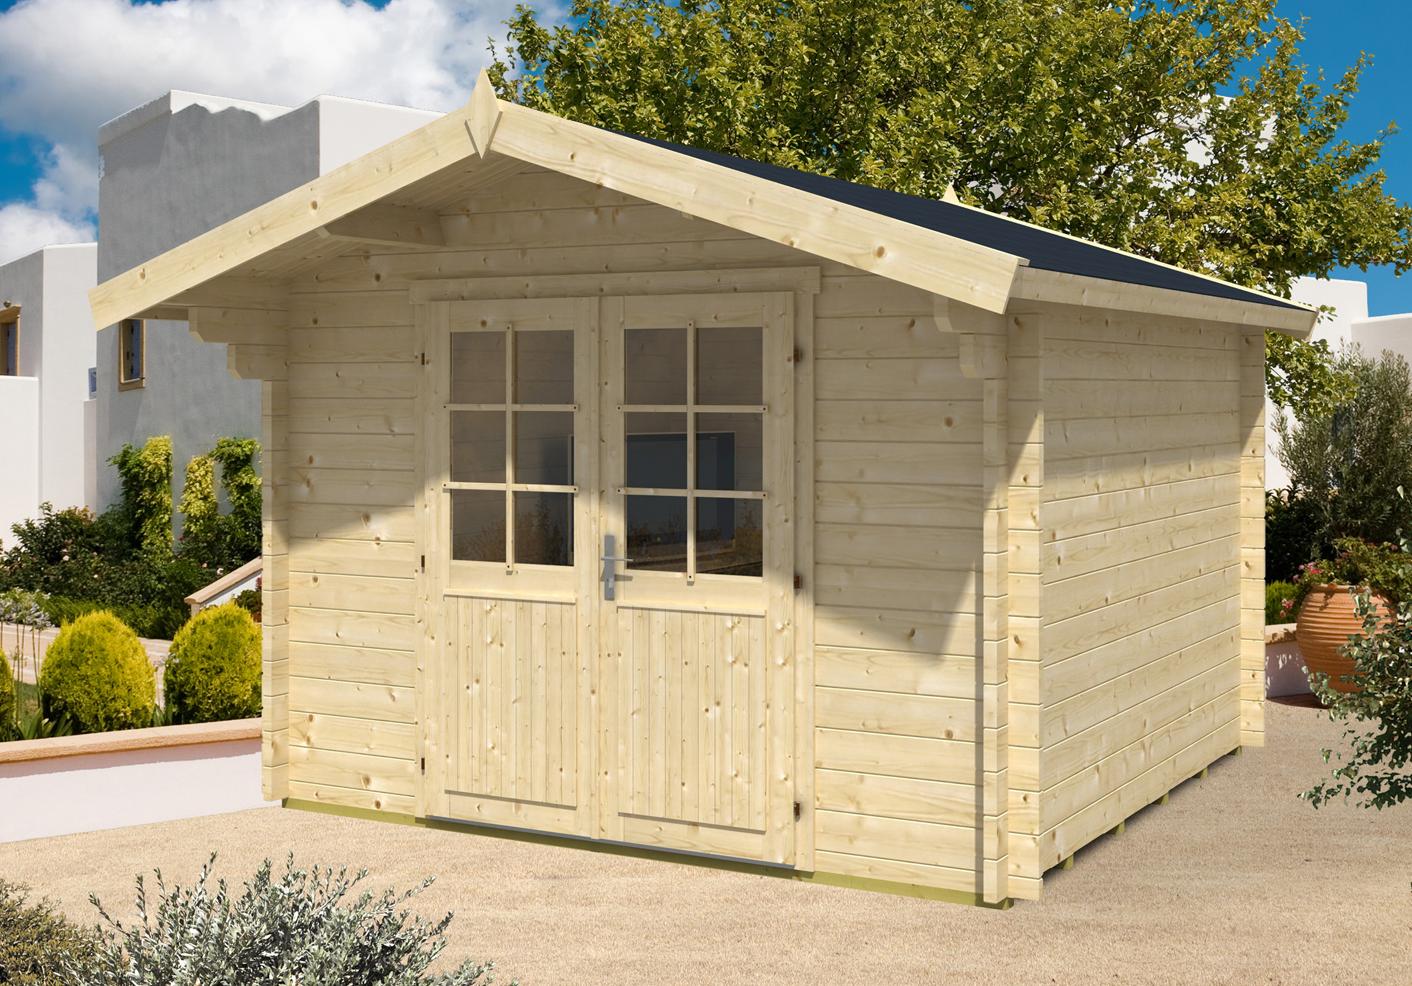 gartenhaus anna 44 iso t02344. Black Bedroom Furniture Sets. Home Design Ideas